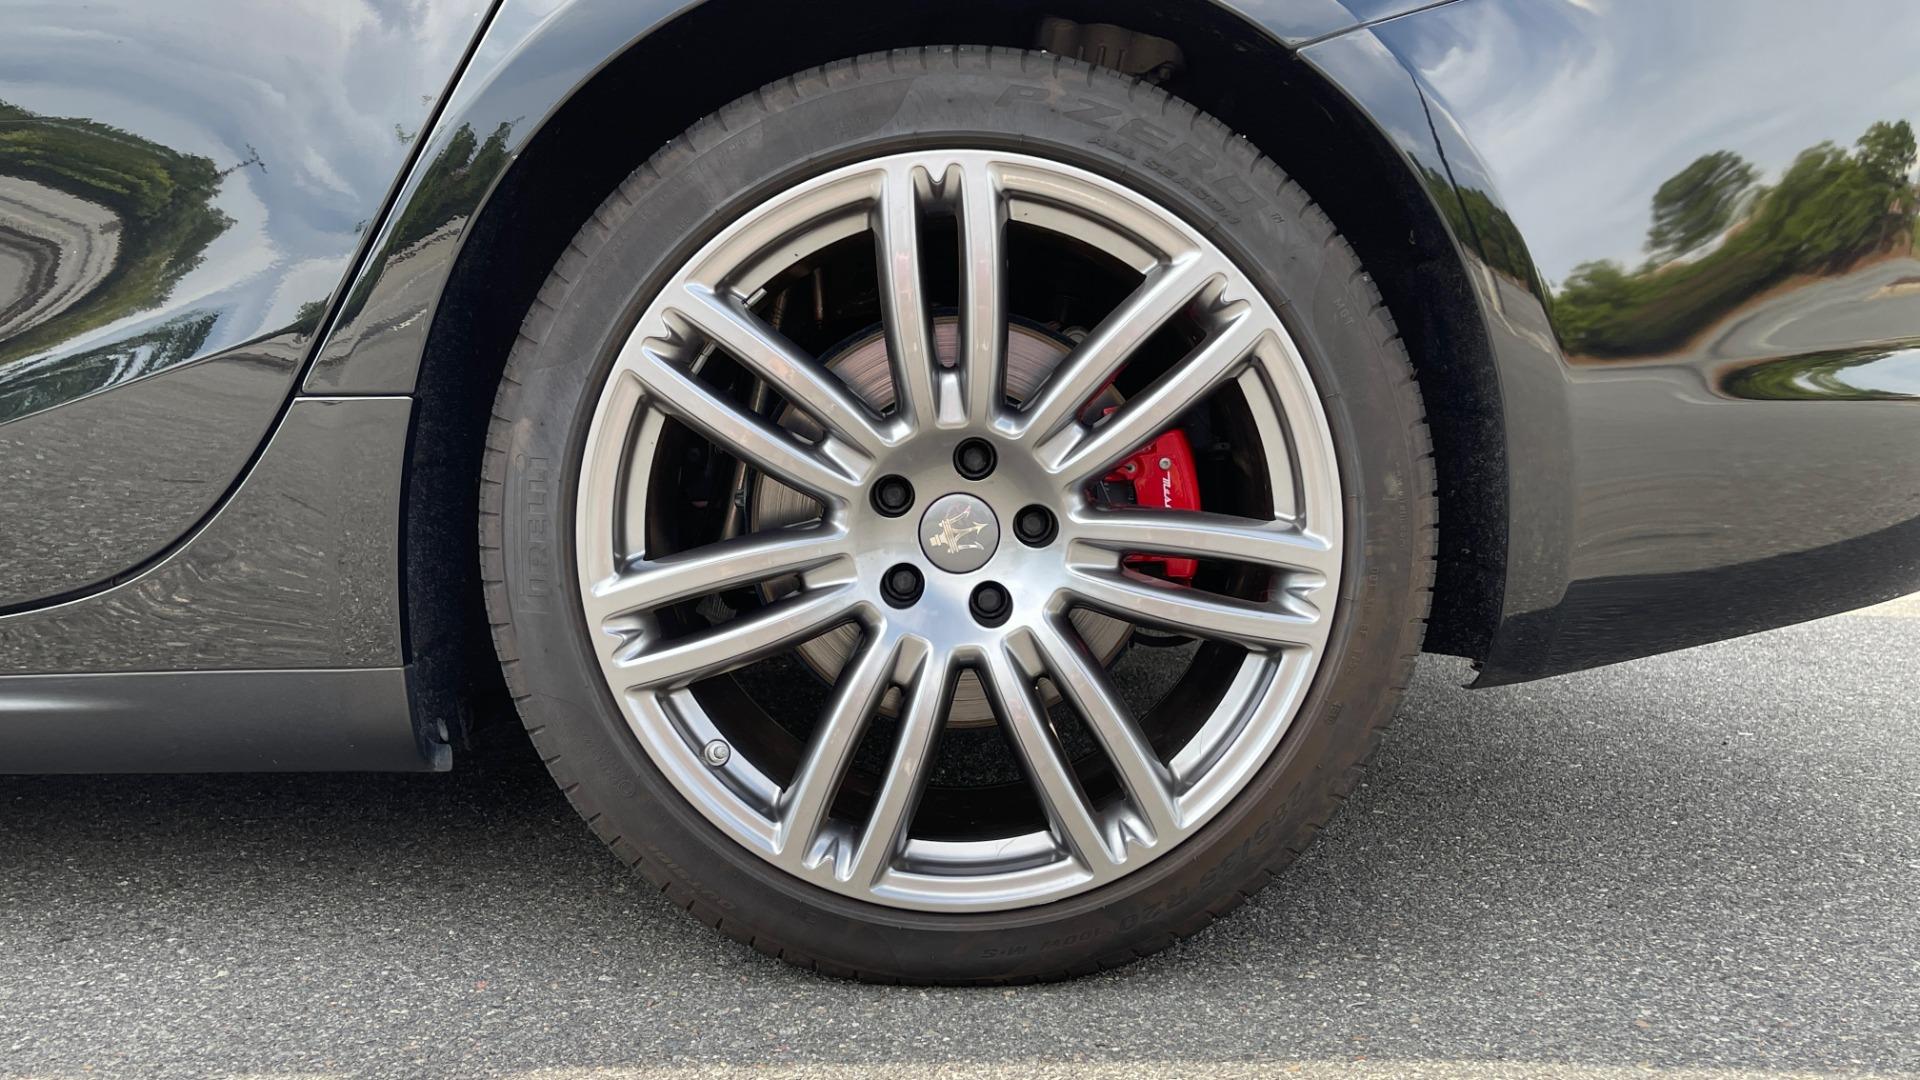 Used 2018 Maserati GHIBLI 3.0L SEDAN / 8-SPD AUTO / NAV / SUNROOF / REARVIEW for sale $42,995 at Formula Imports in Charlotte NC 28227 63